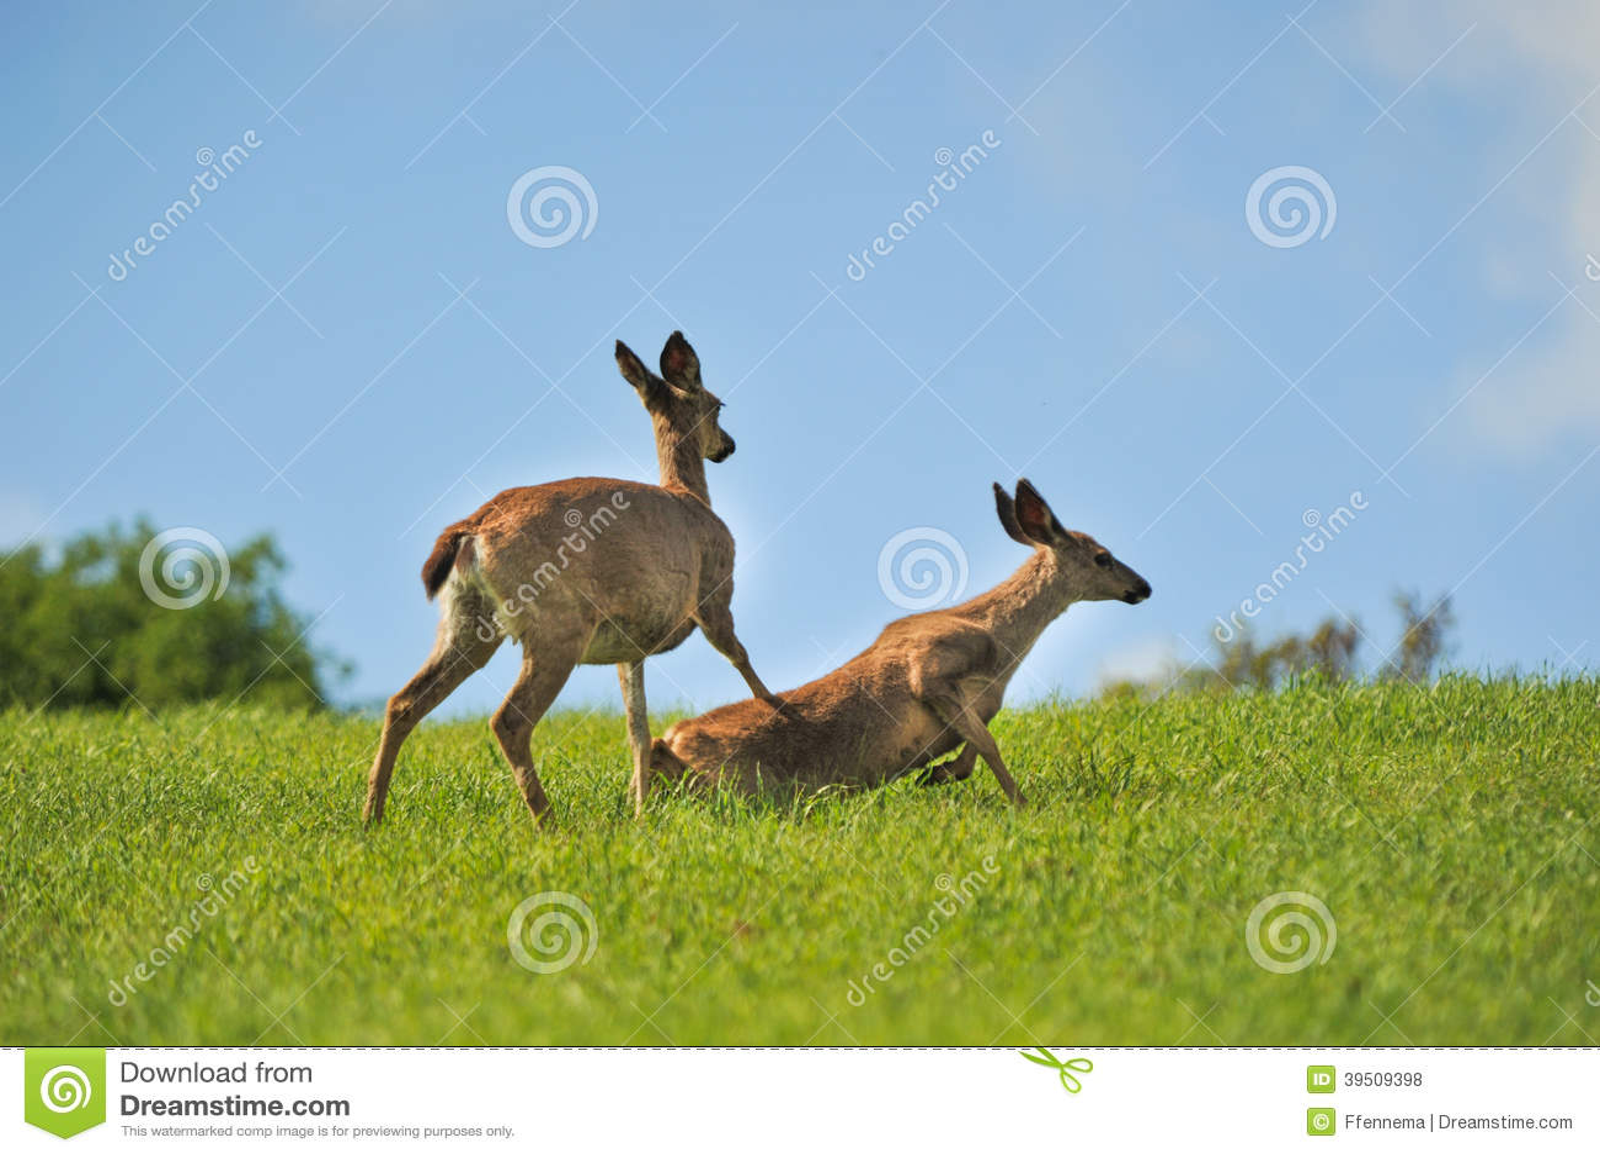 Mother deer pushes her doe down